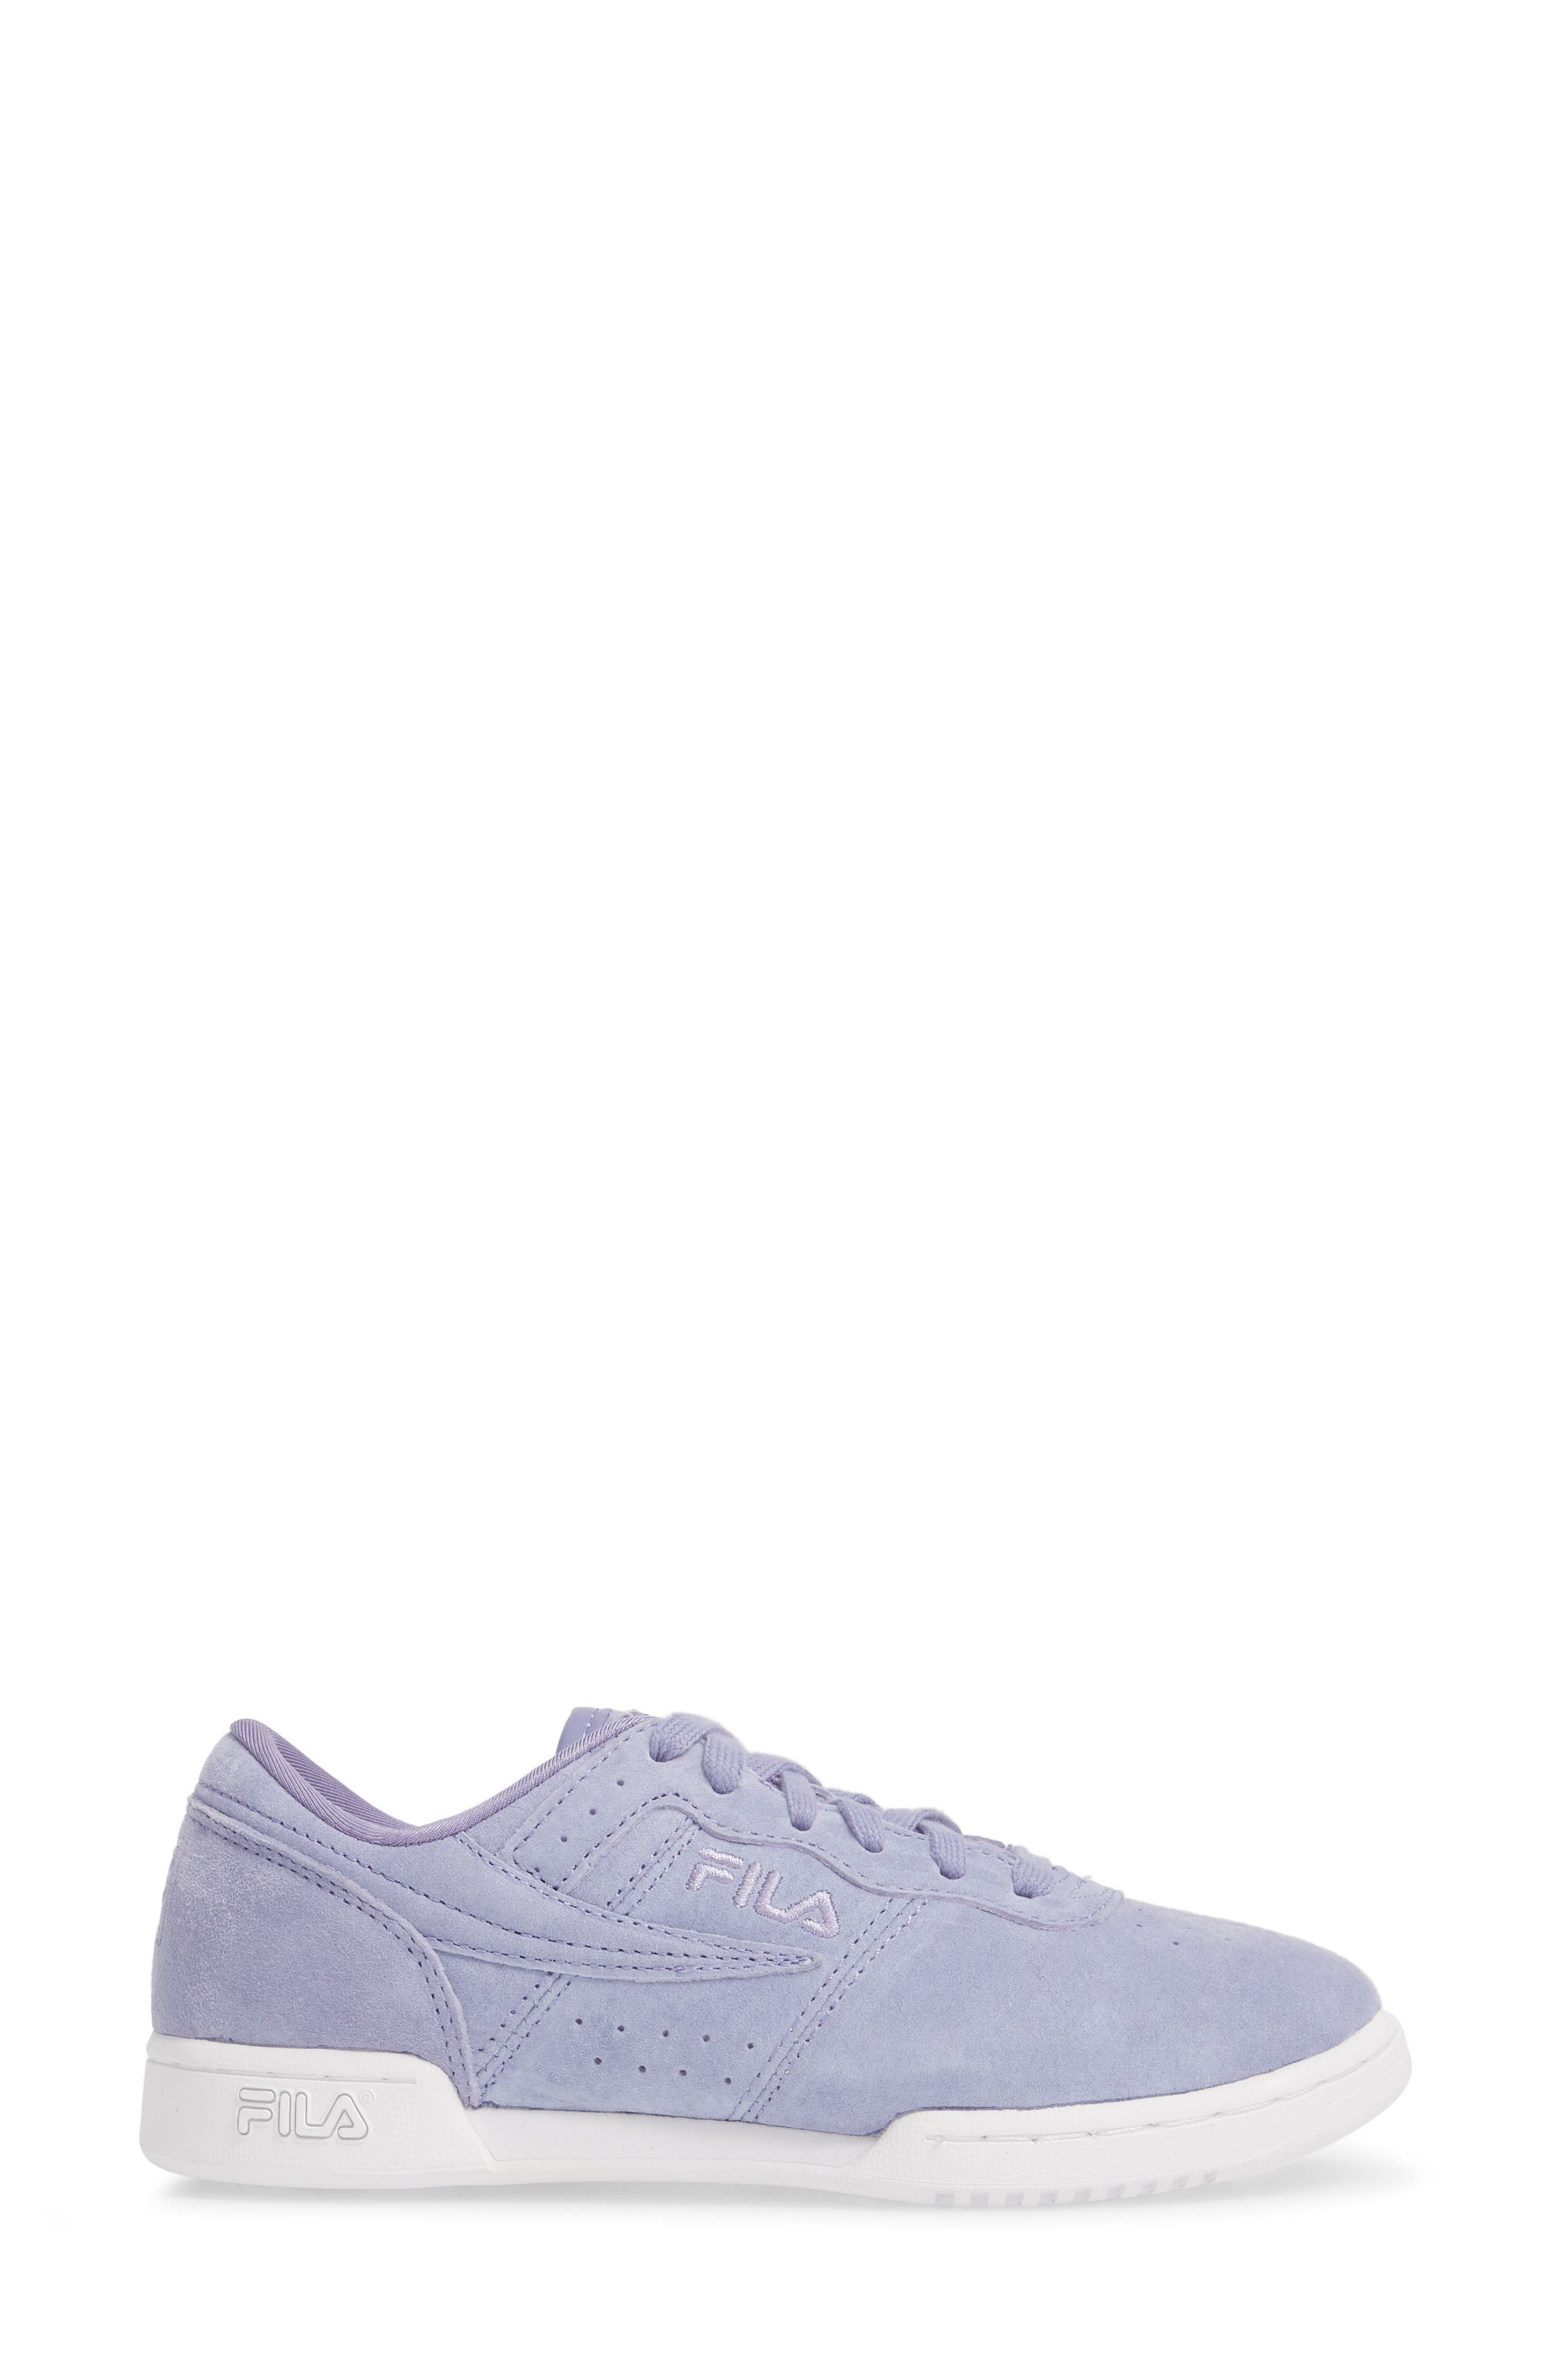 Alternate Image 3  - FILA Original Fitness Premium Sneaker (Women)